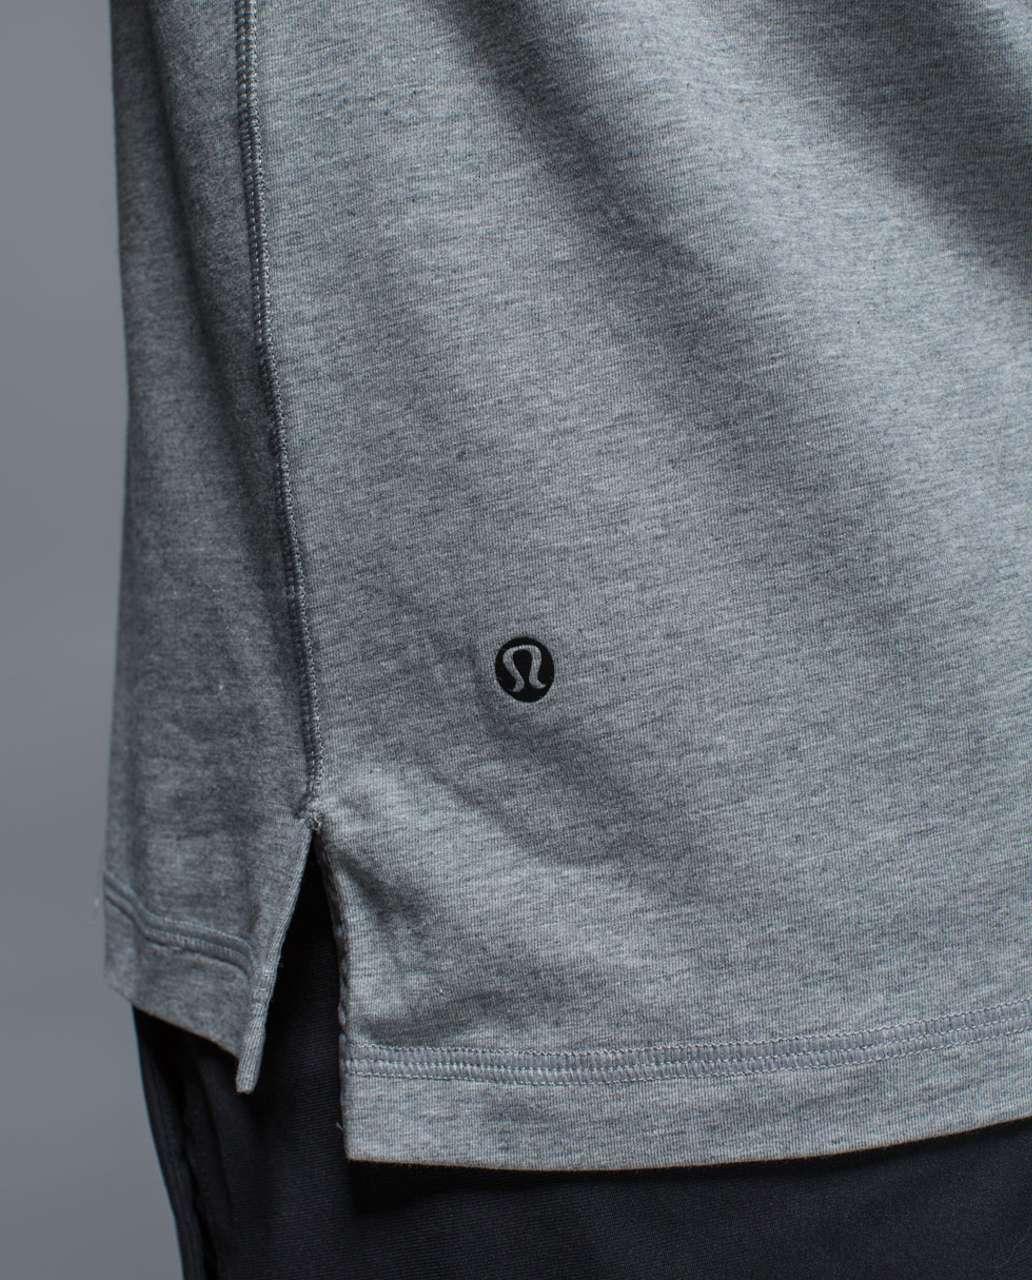 Lululemon Union Polo - Heathered Medium Grey / Slate